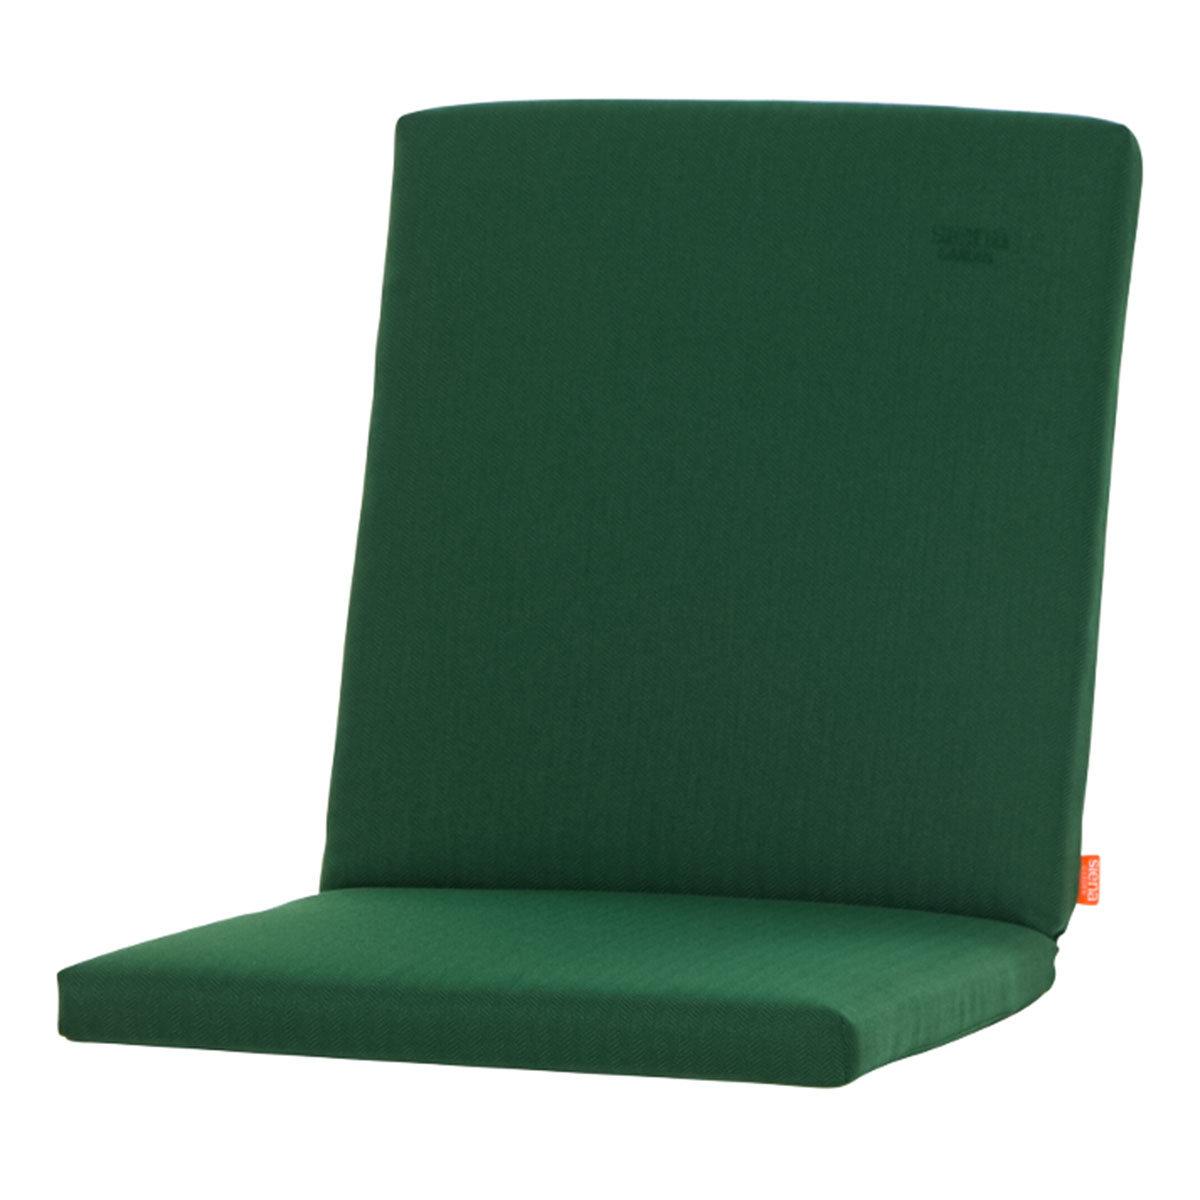 Sessel-Auflage Aster, smaragdgrün